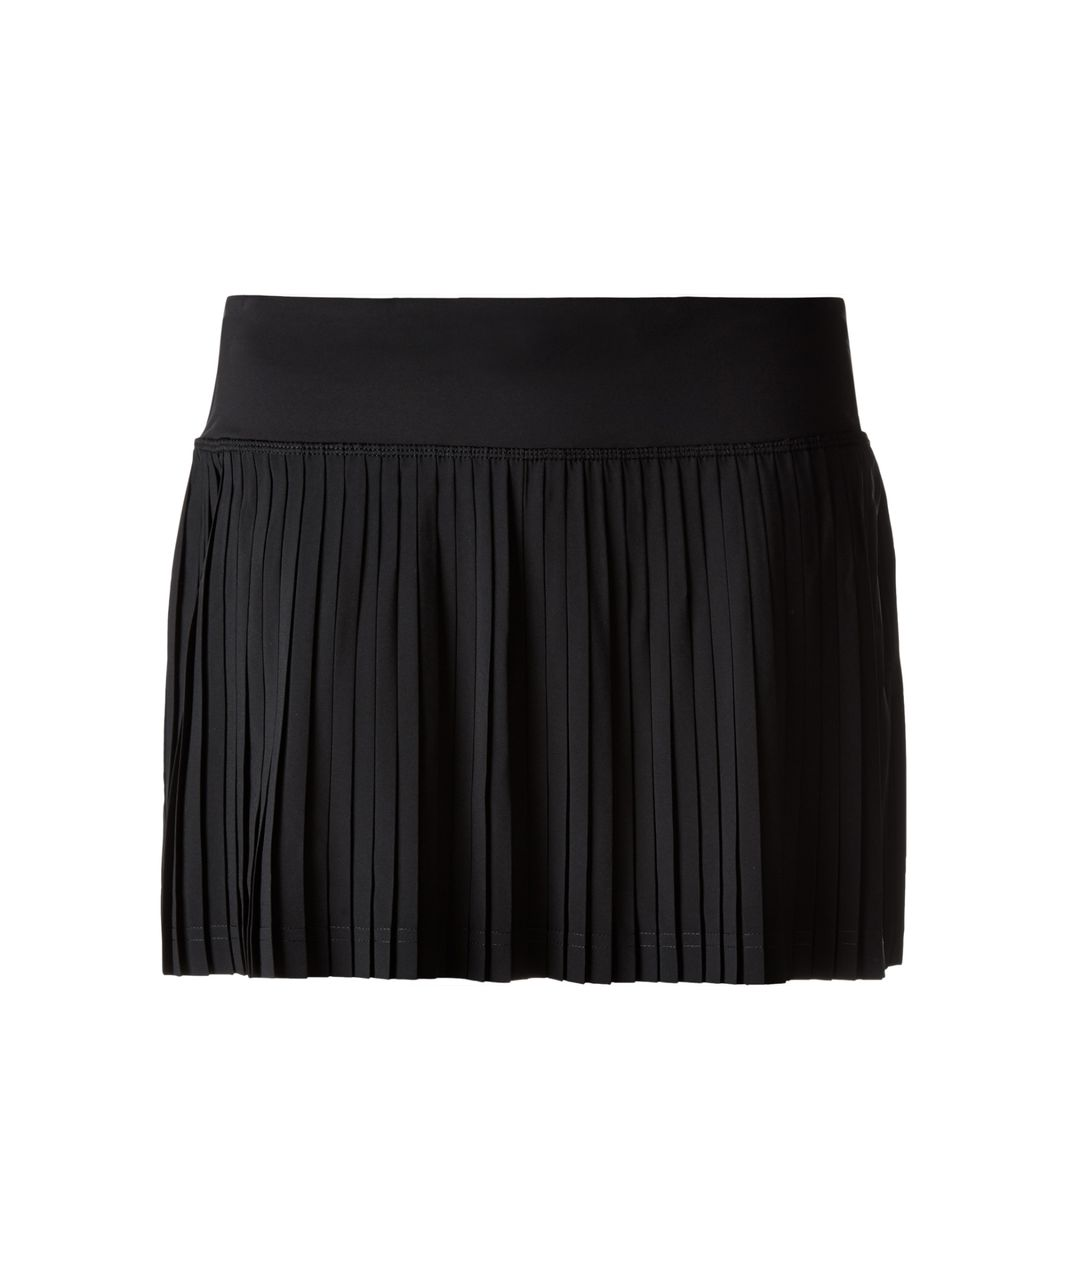 fc3dd4788a Lululemon Pleat To Street Skirt II - Black - lulu fanatics